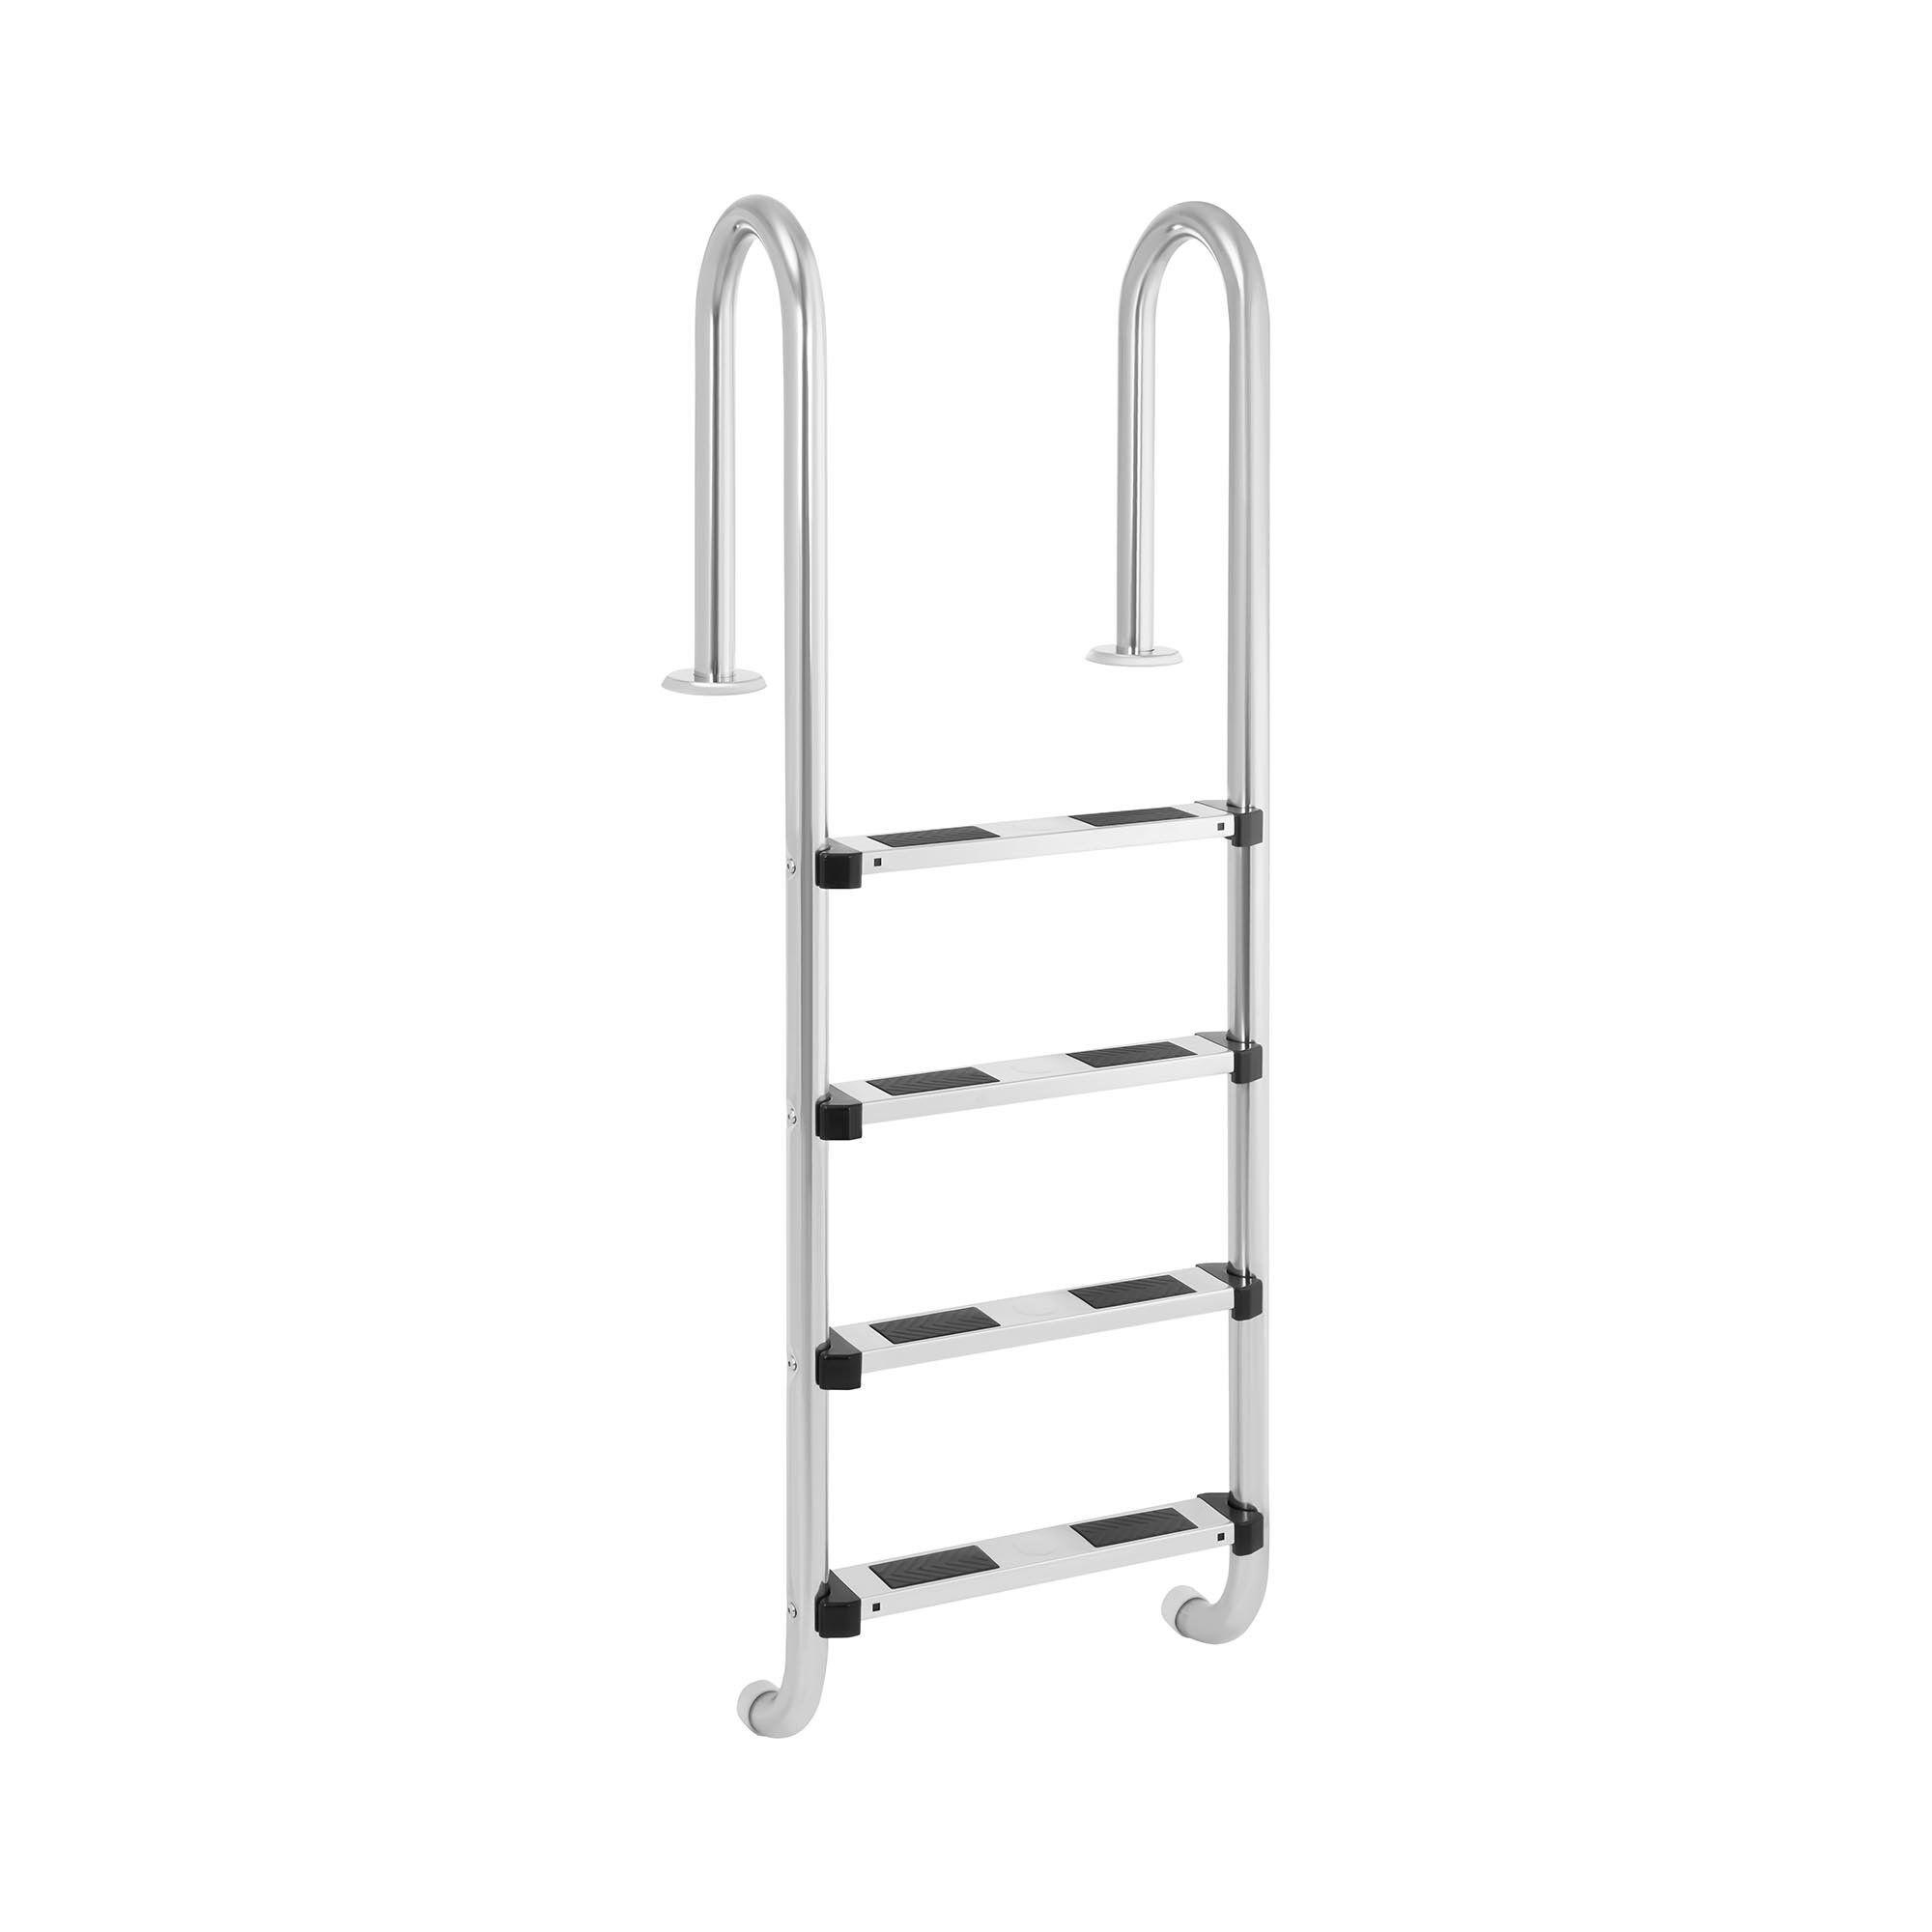 Uniprodo Pool ladder - 4 Steps - Narrow stile bow